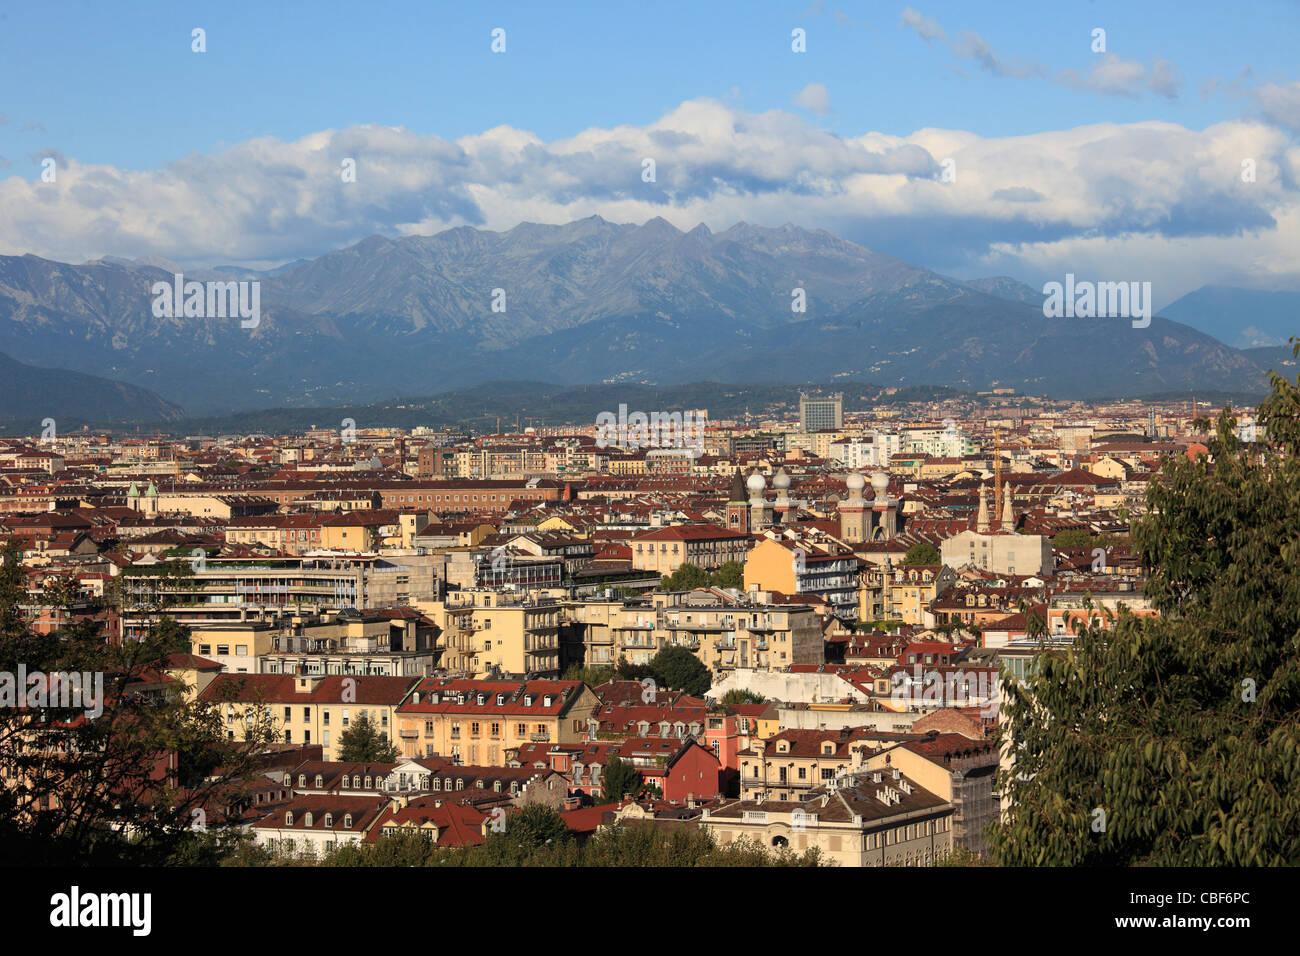 Italy, Piedmont, Turin, general view, skyline, - Stock Image